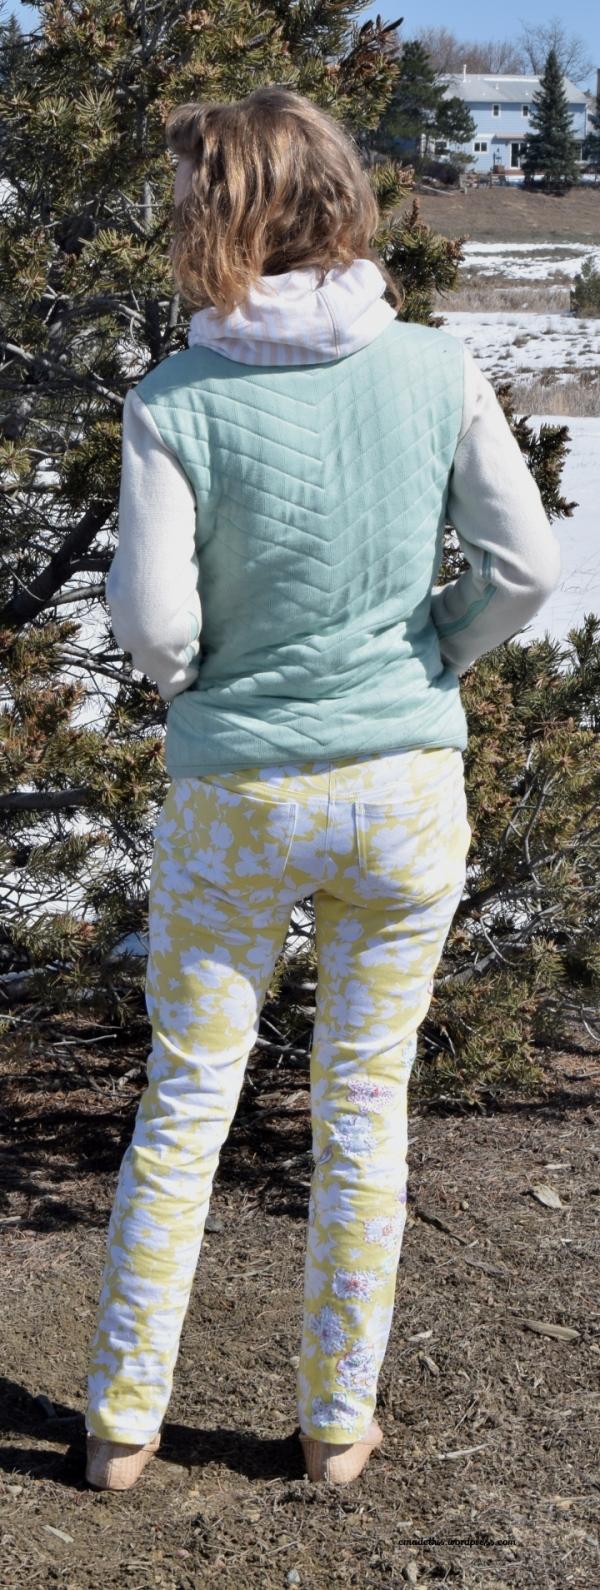 lemonfloralembroideryjeansback